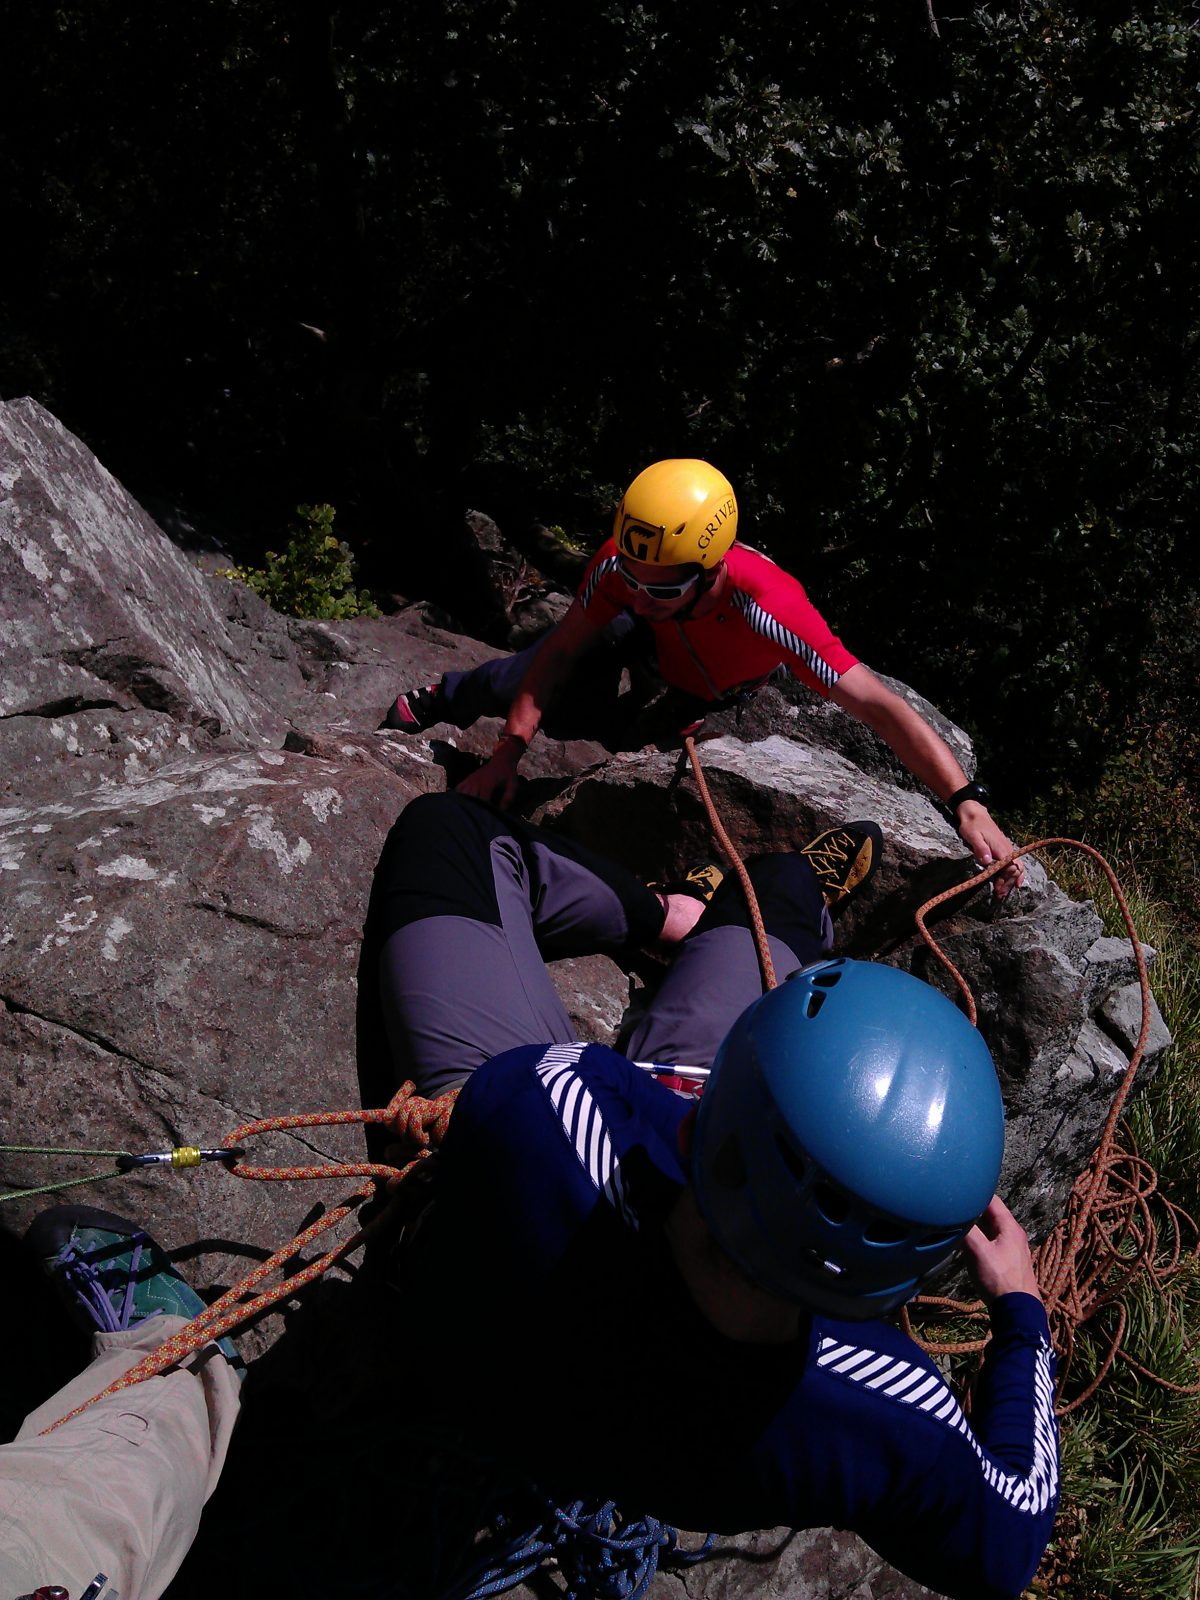 Climber progression climbing courses Snowdonia Higher climbing wales